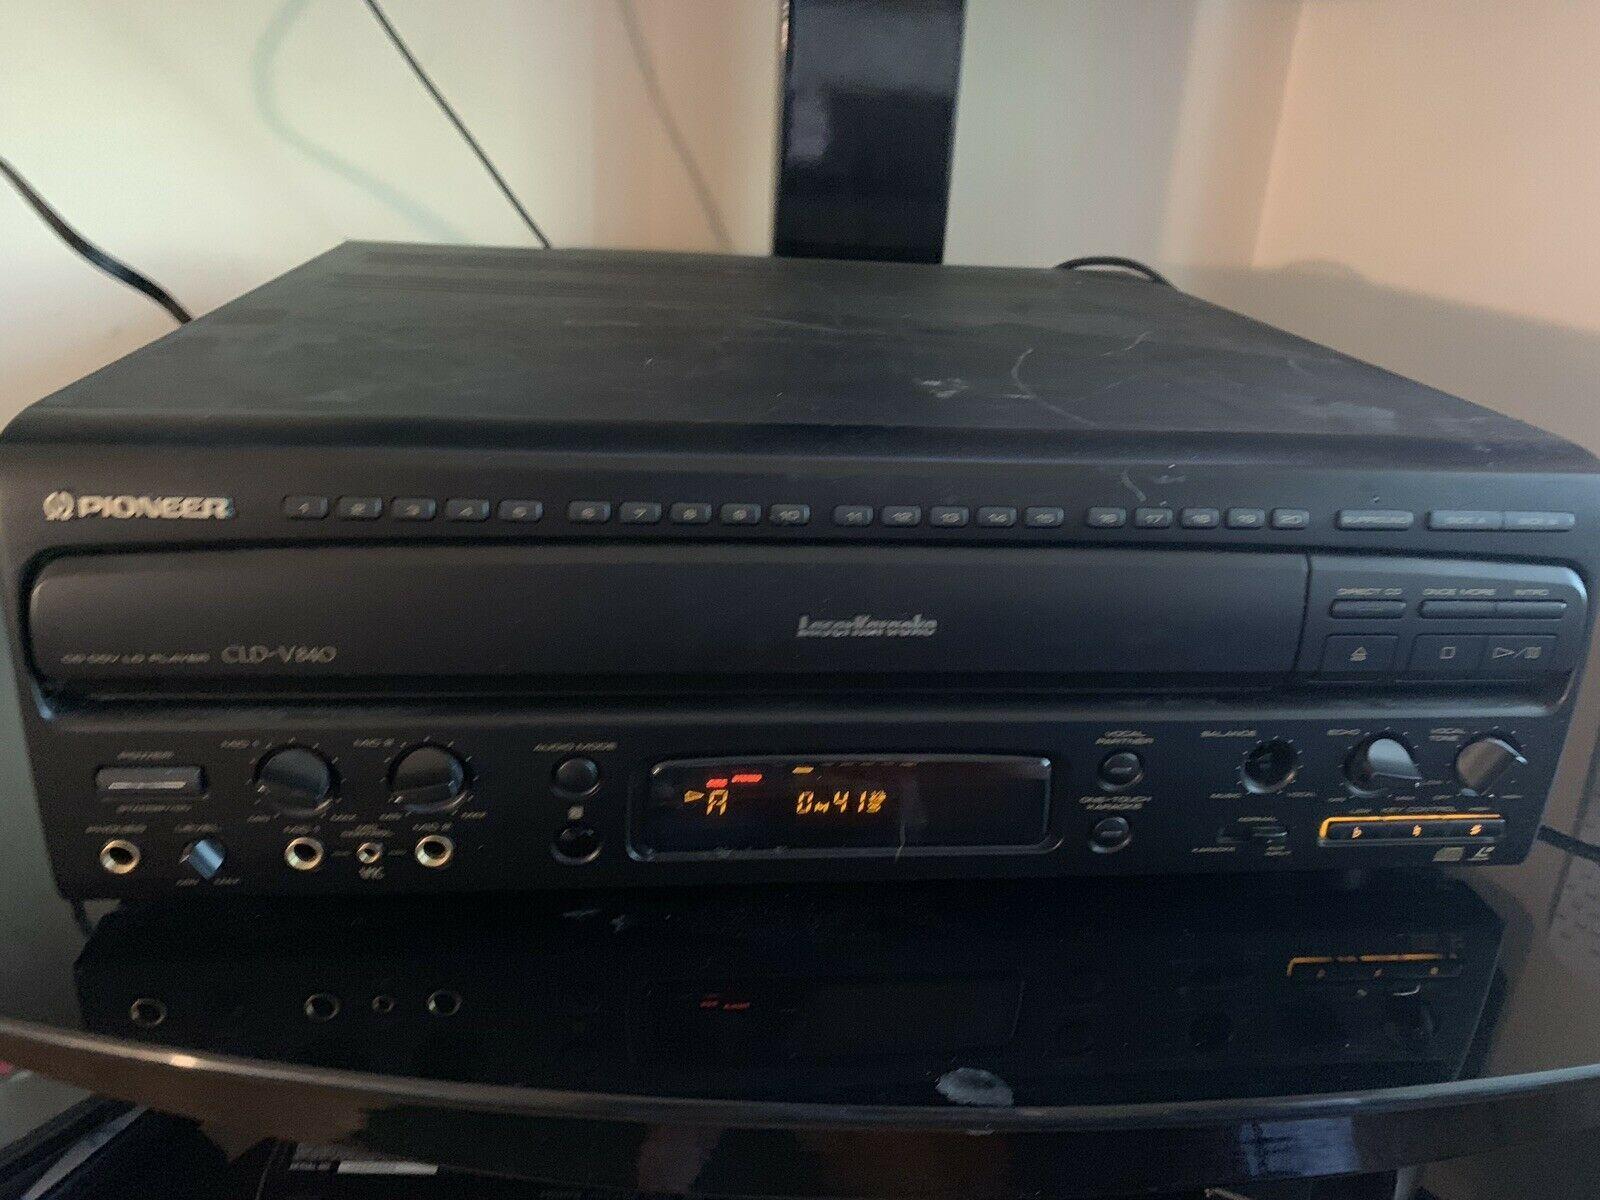 pioneer laserdisc karaoke player #Laserdisc #Discplayer #karaokeplayer